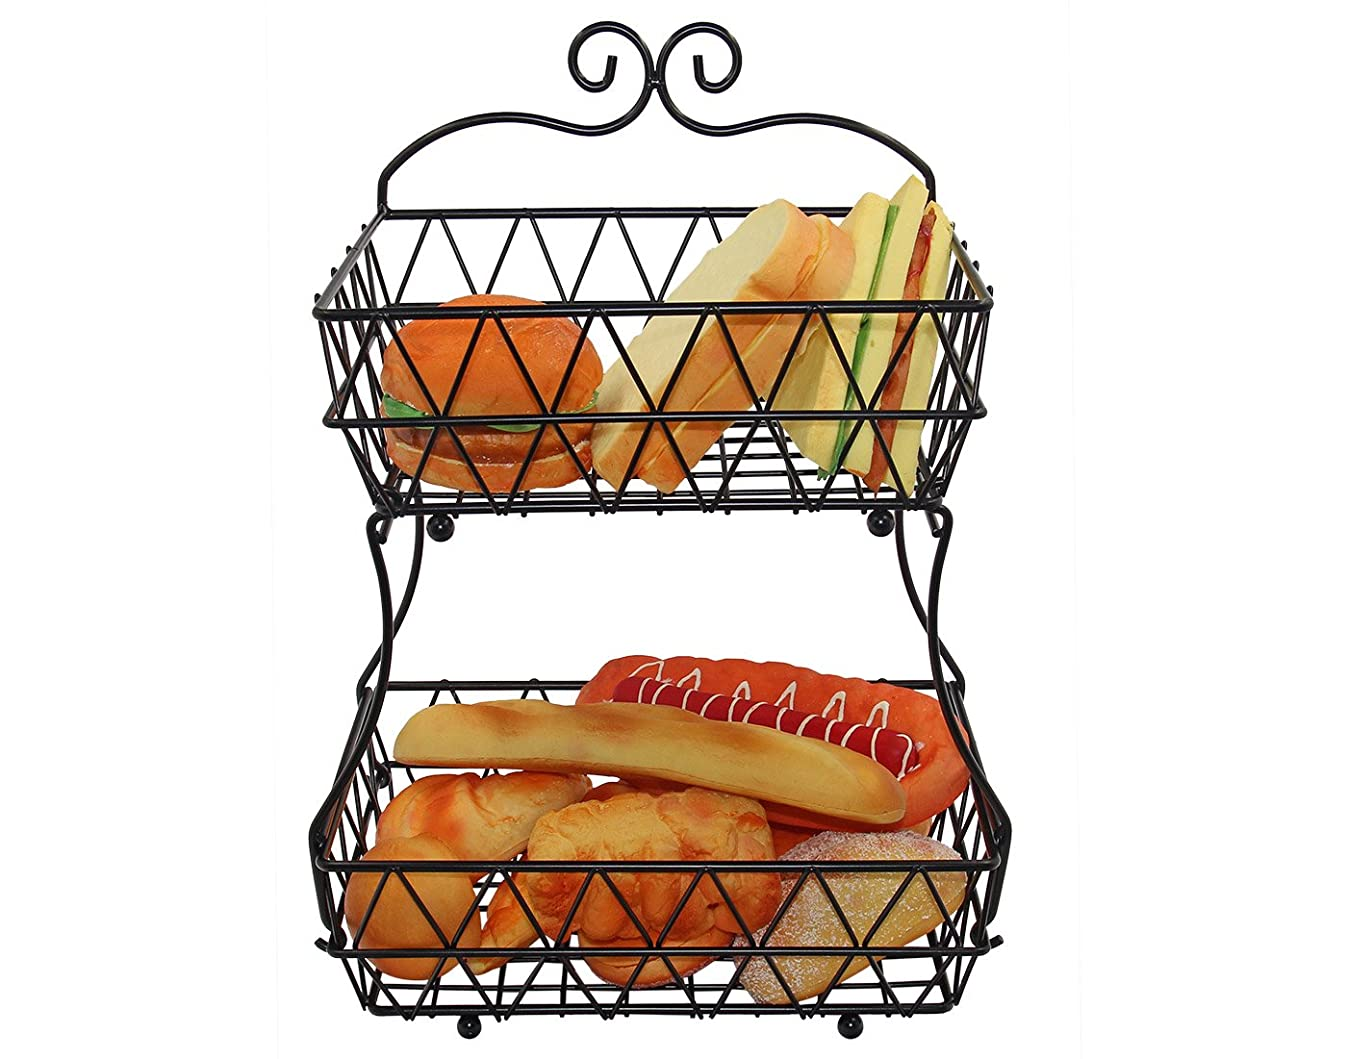 IZLIF Fruit Baskets 2 Tier Metal Bread Basket Storage Display Stand for Kitchen with Screws Free Design,Black